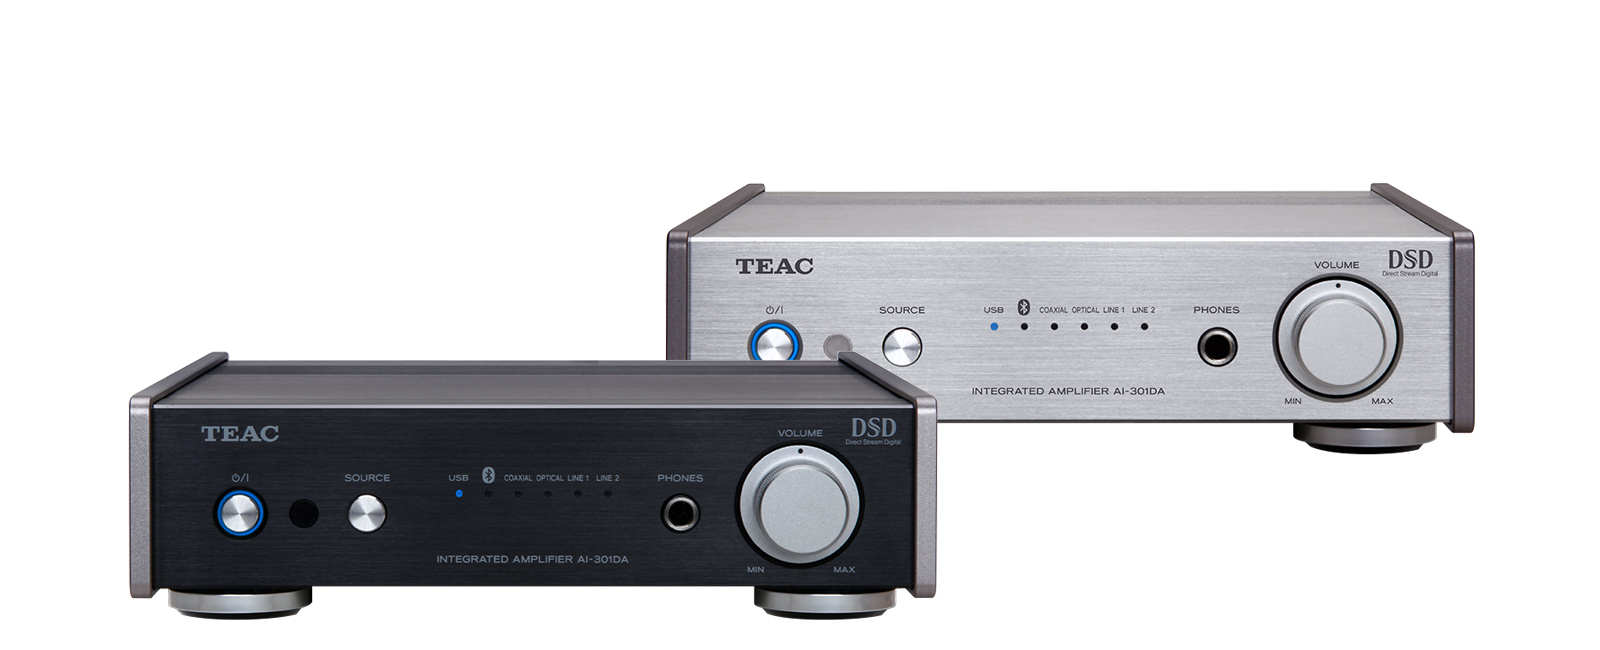 AI-301DA-SP | 製品トップ | TEAC - オーディオ製品情報サイト